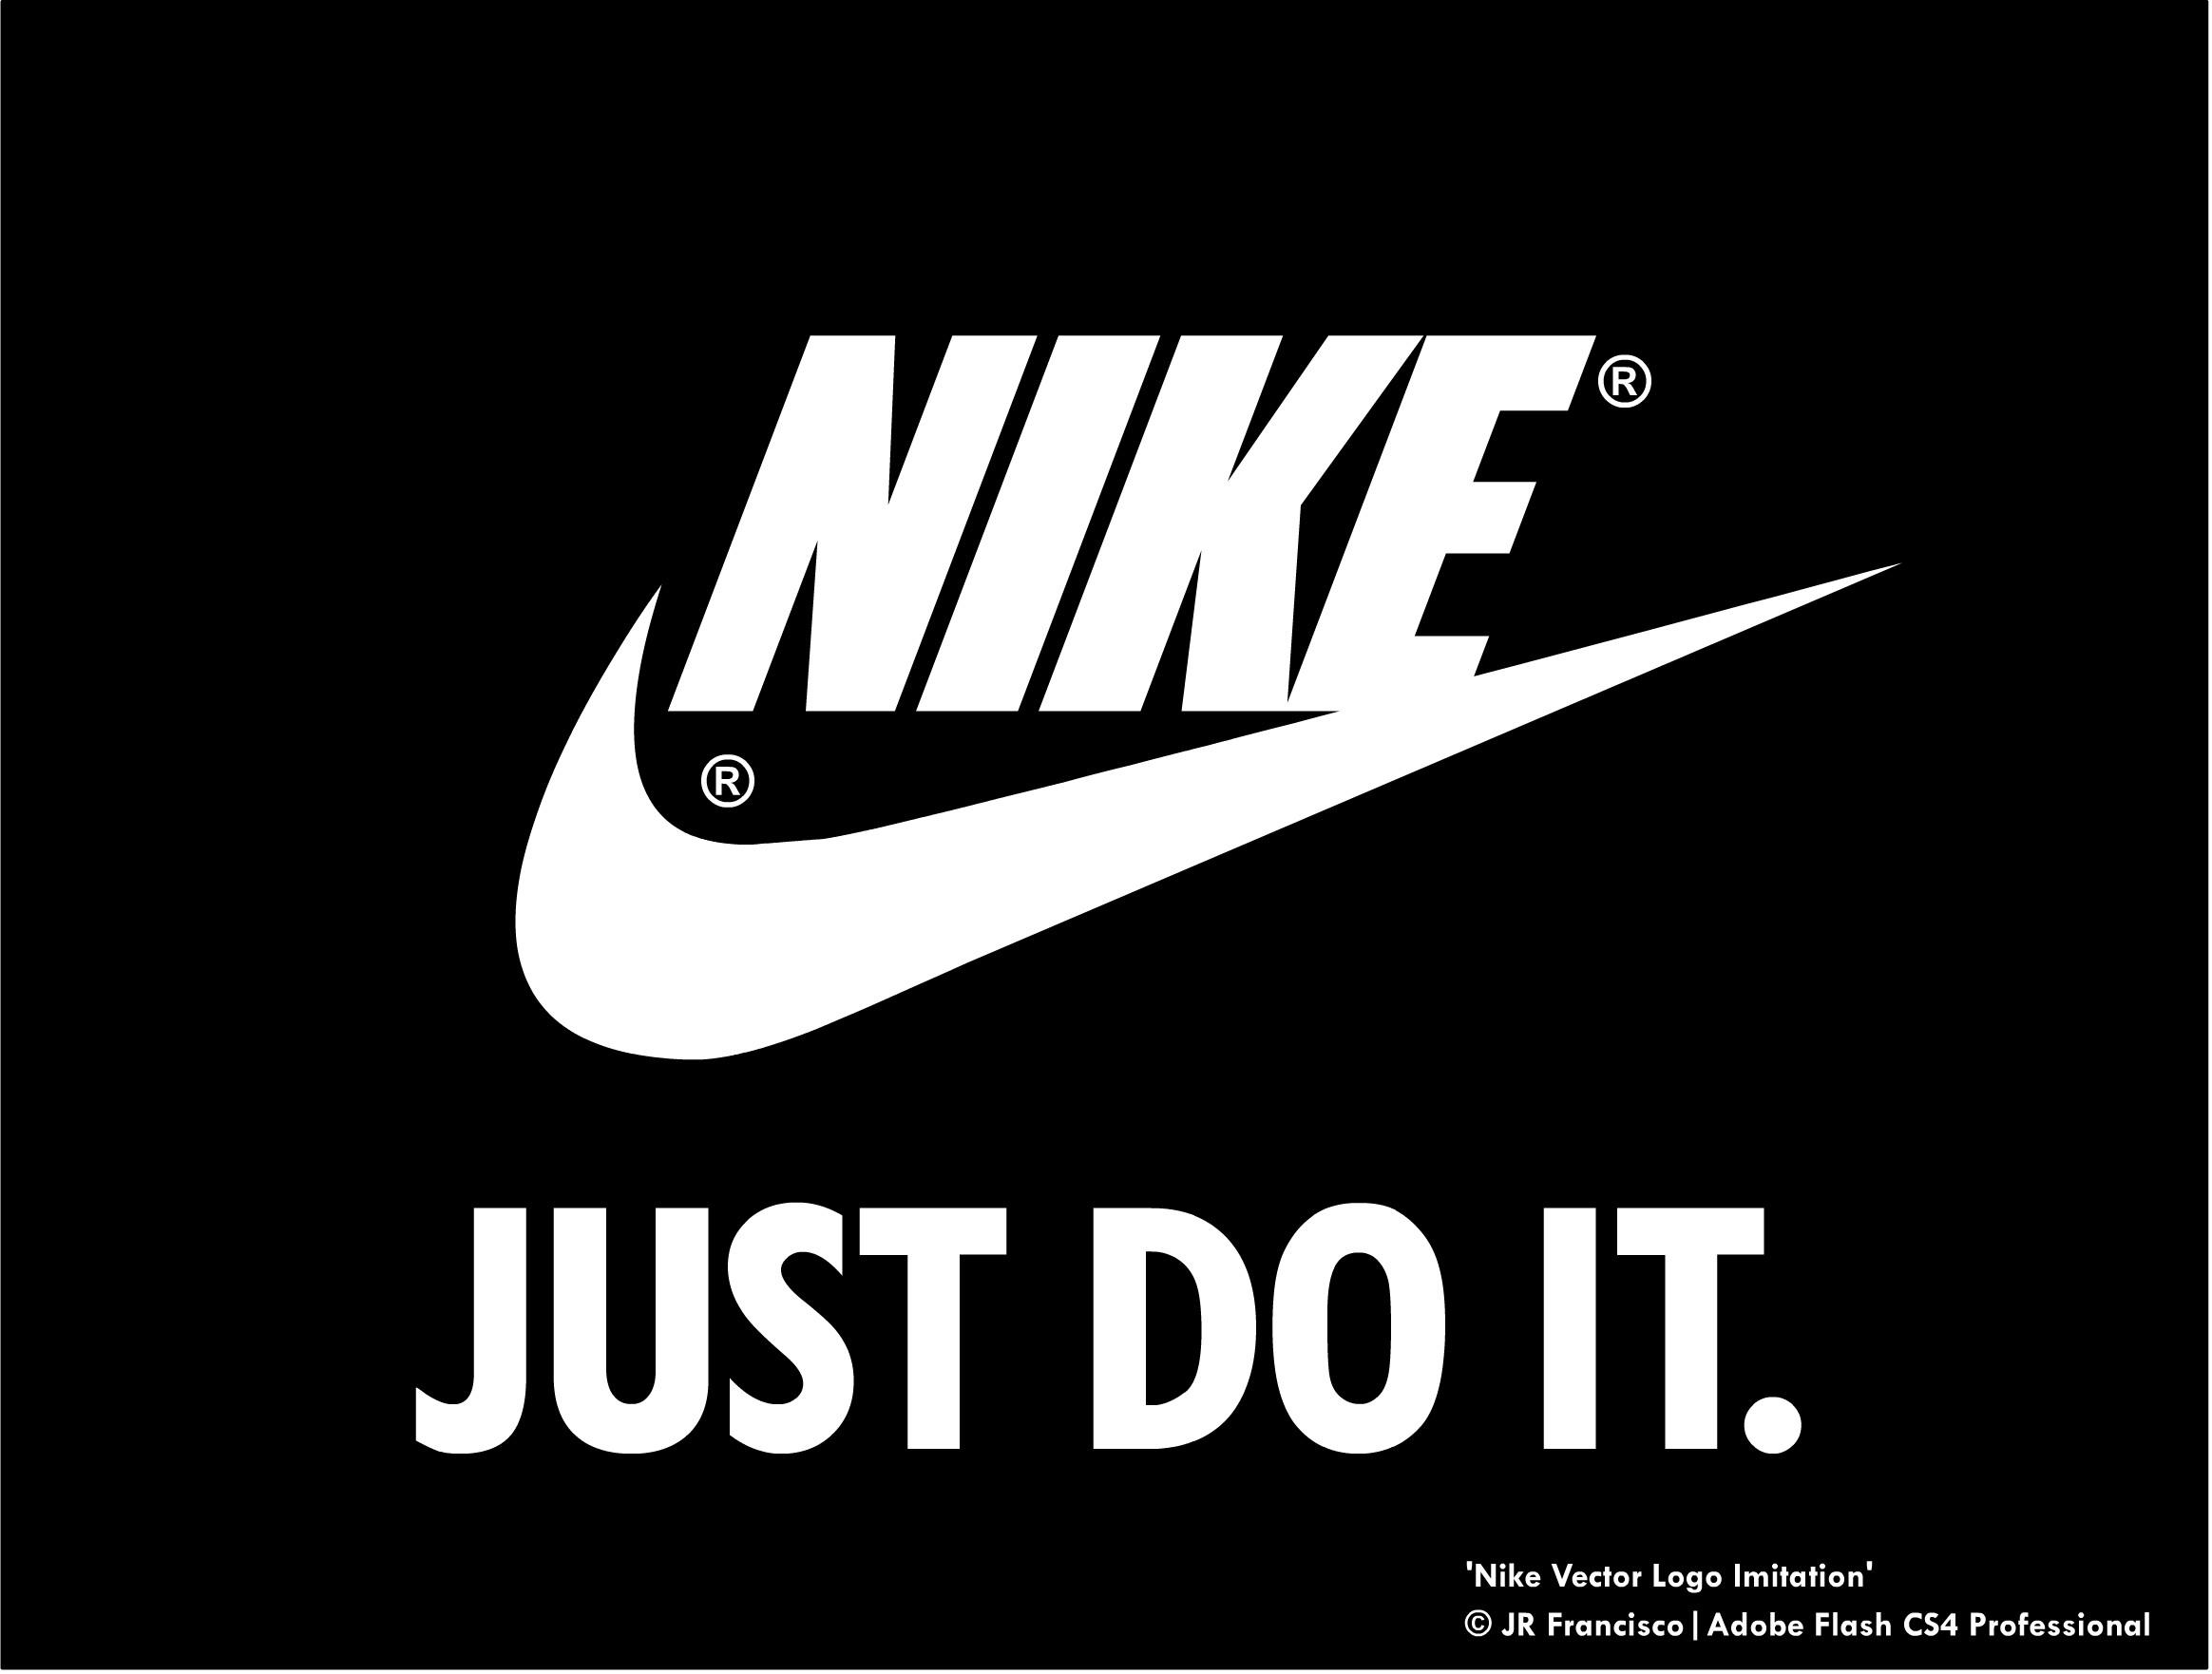 0047a98b4824c21b29f6e0fe7cfd52e7_nike-just-do-it-pink-just-do-it-. Nike  WallpaperNike …